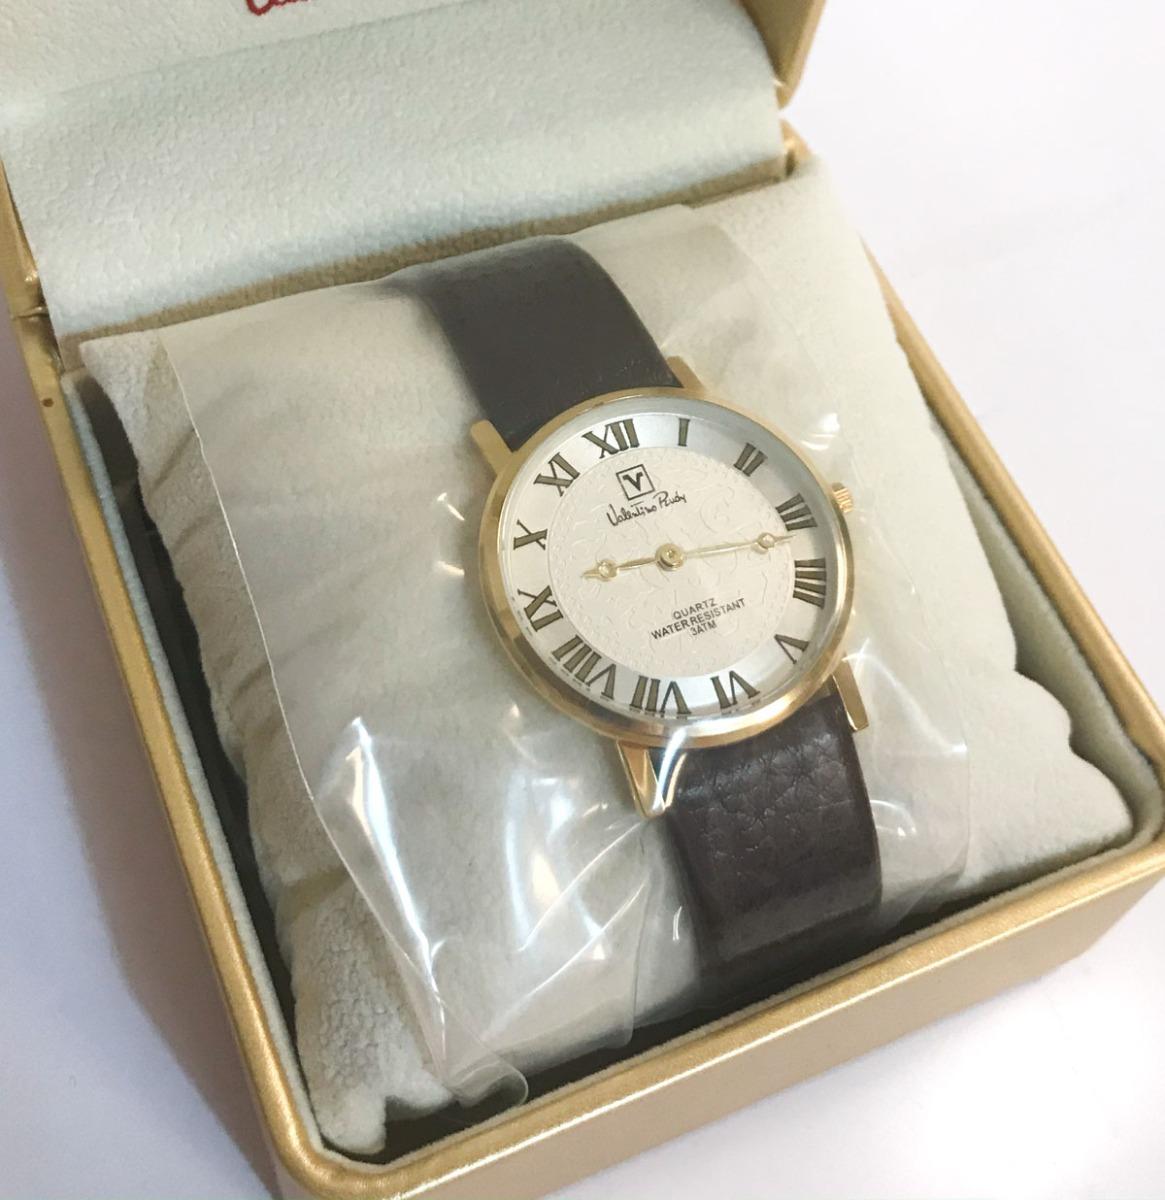 Valentino Rudy Round Face Leather Strap Heren Horloge Goud